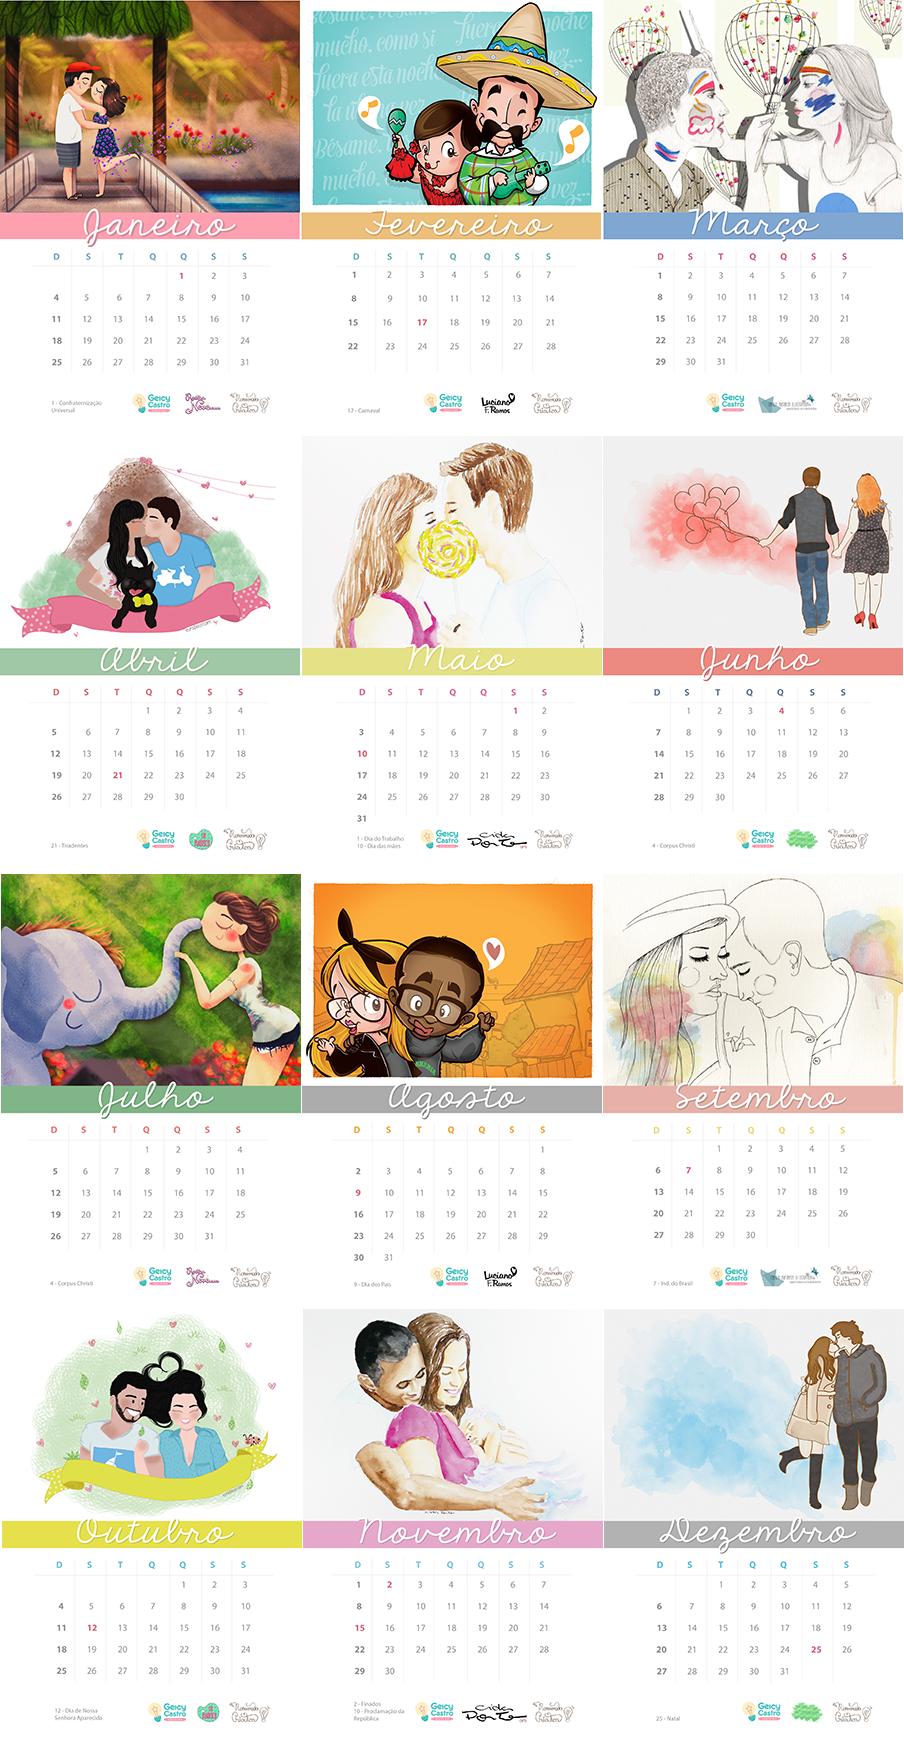 calendario2015_completo